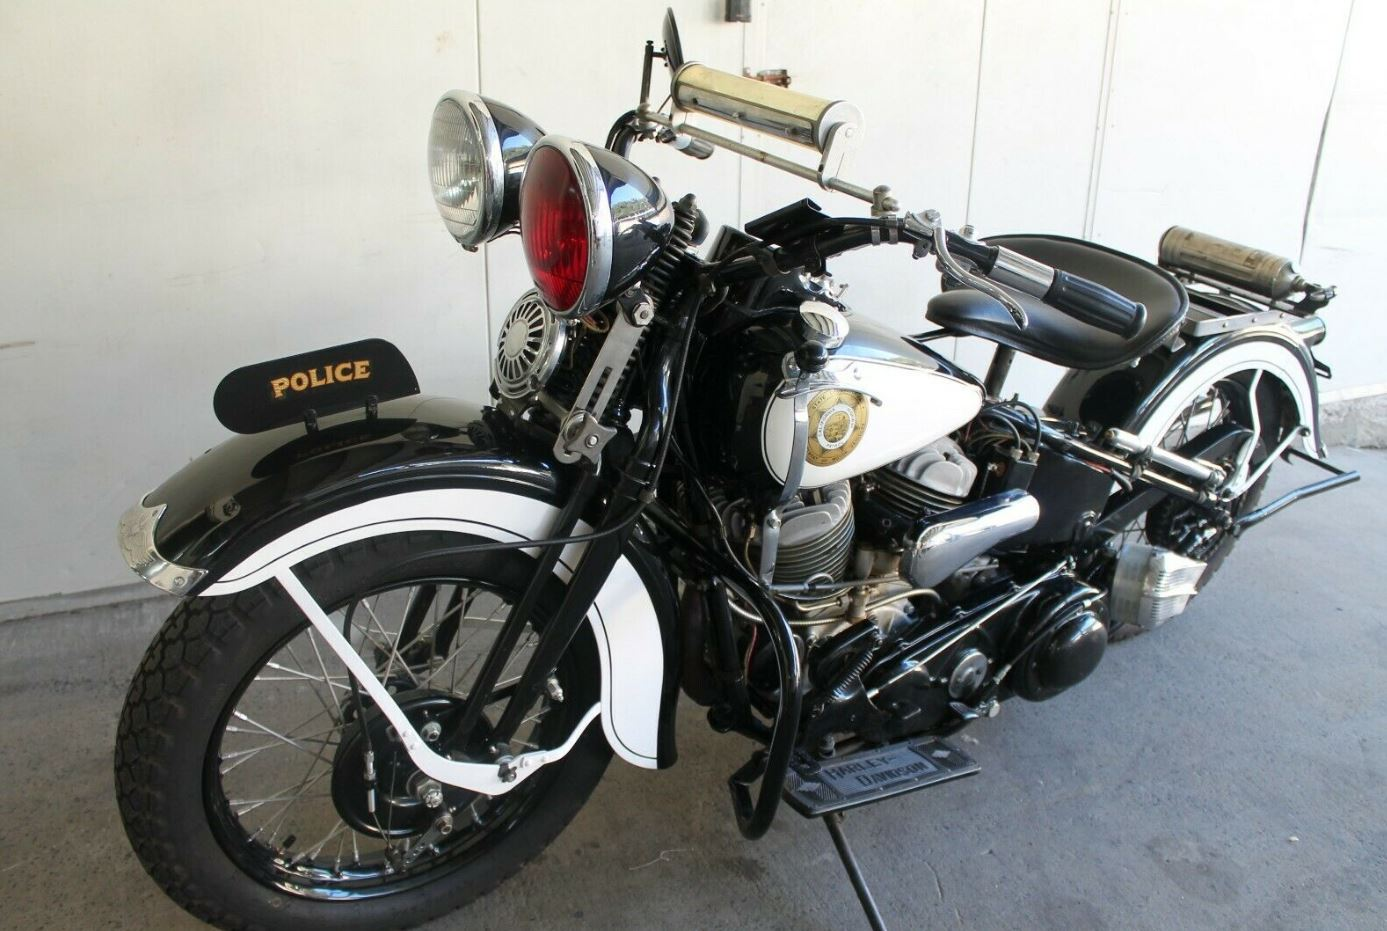 California Highway Patrol in Australia – 1938 Harley-Davidson ULH